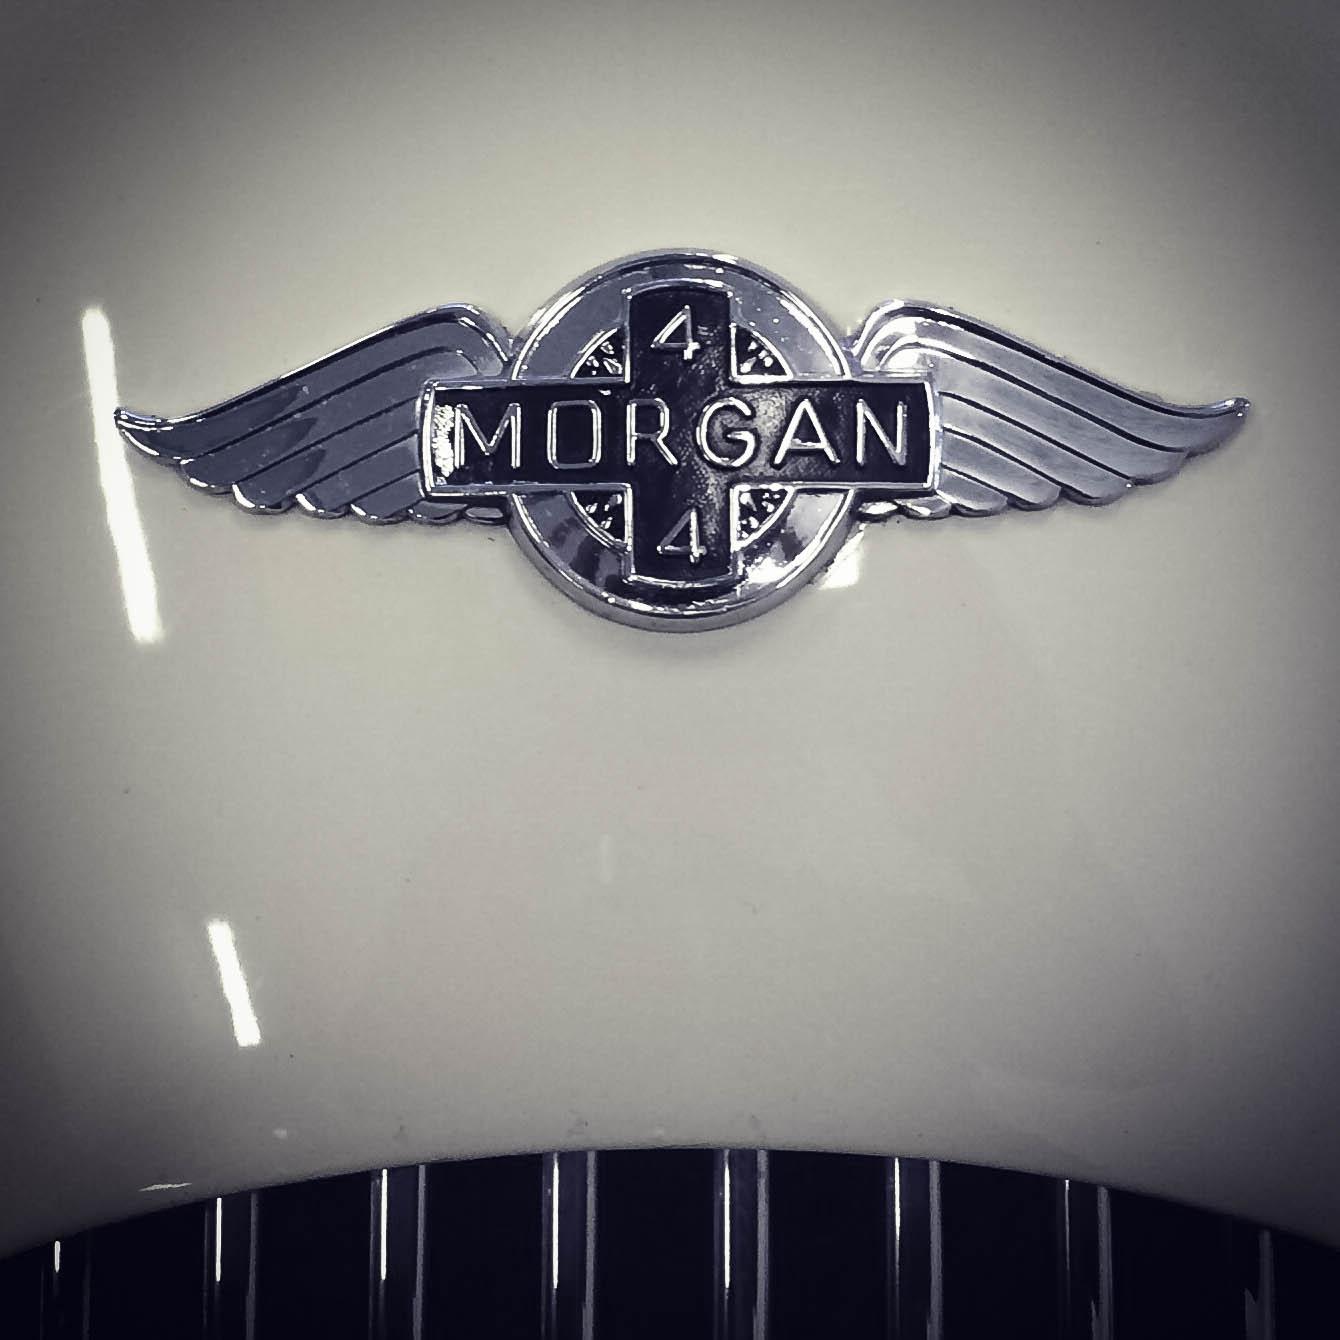 Morgan – Winged badge